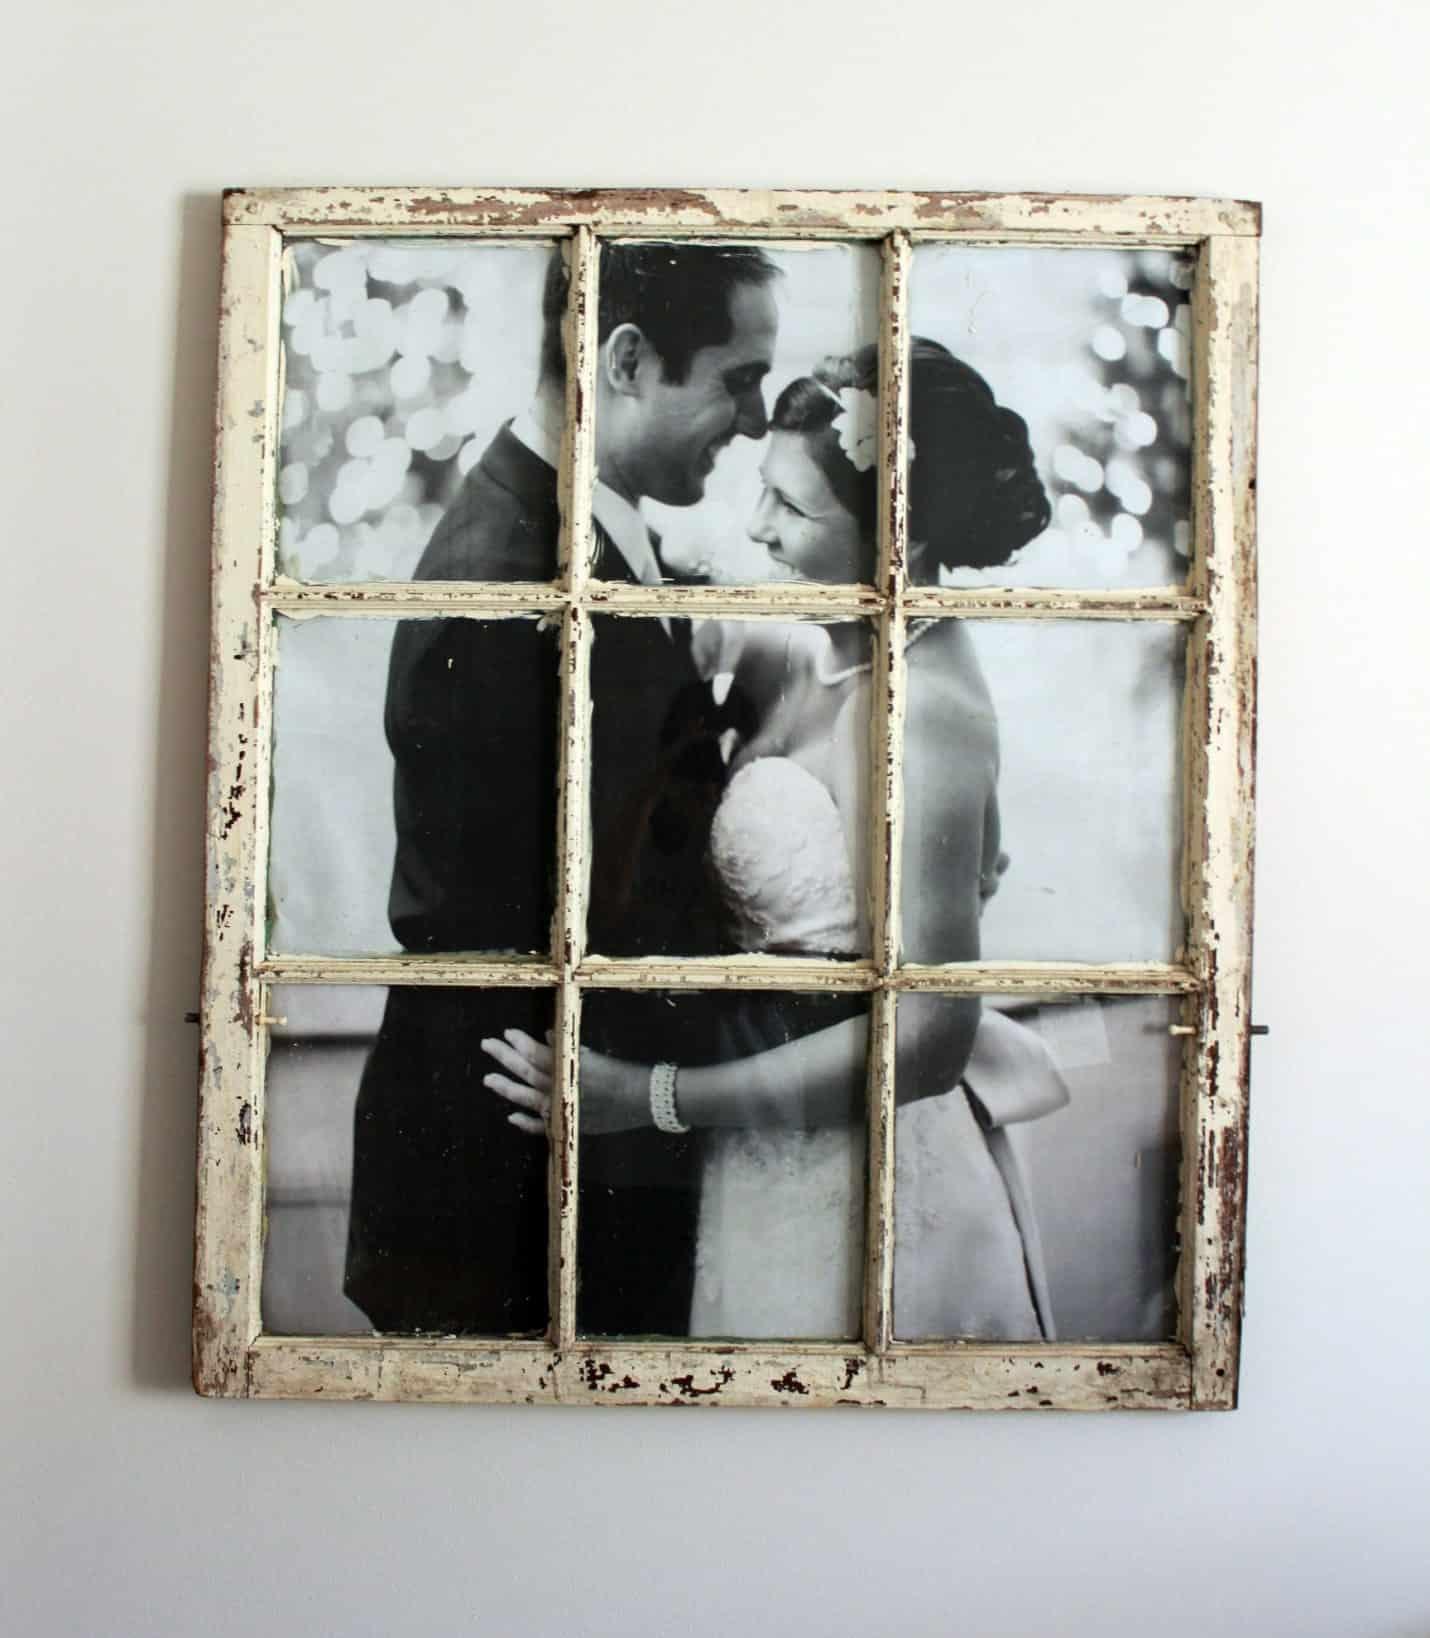 Rustic photo frame